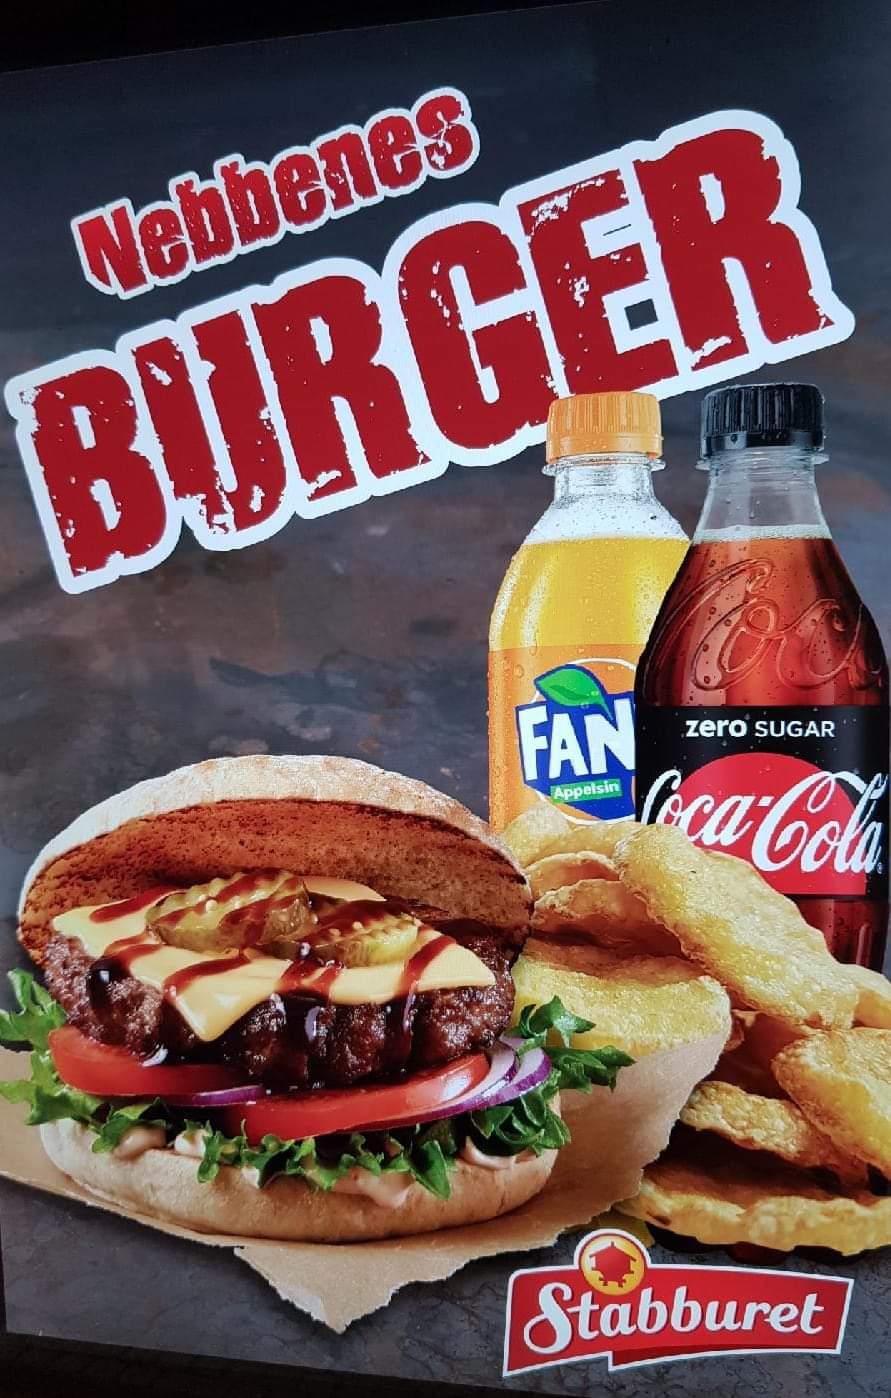 nebbenesburger